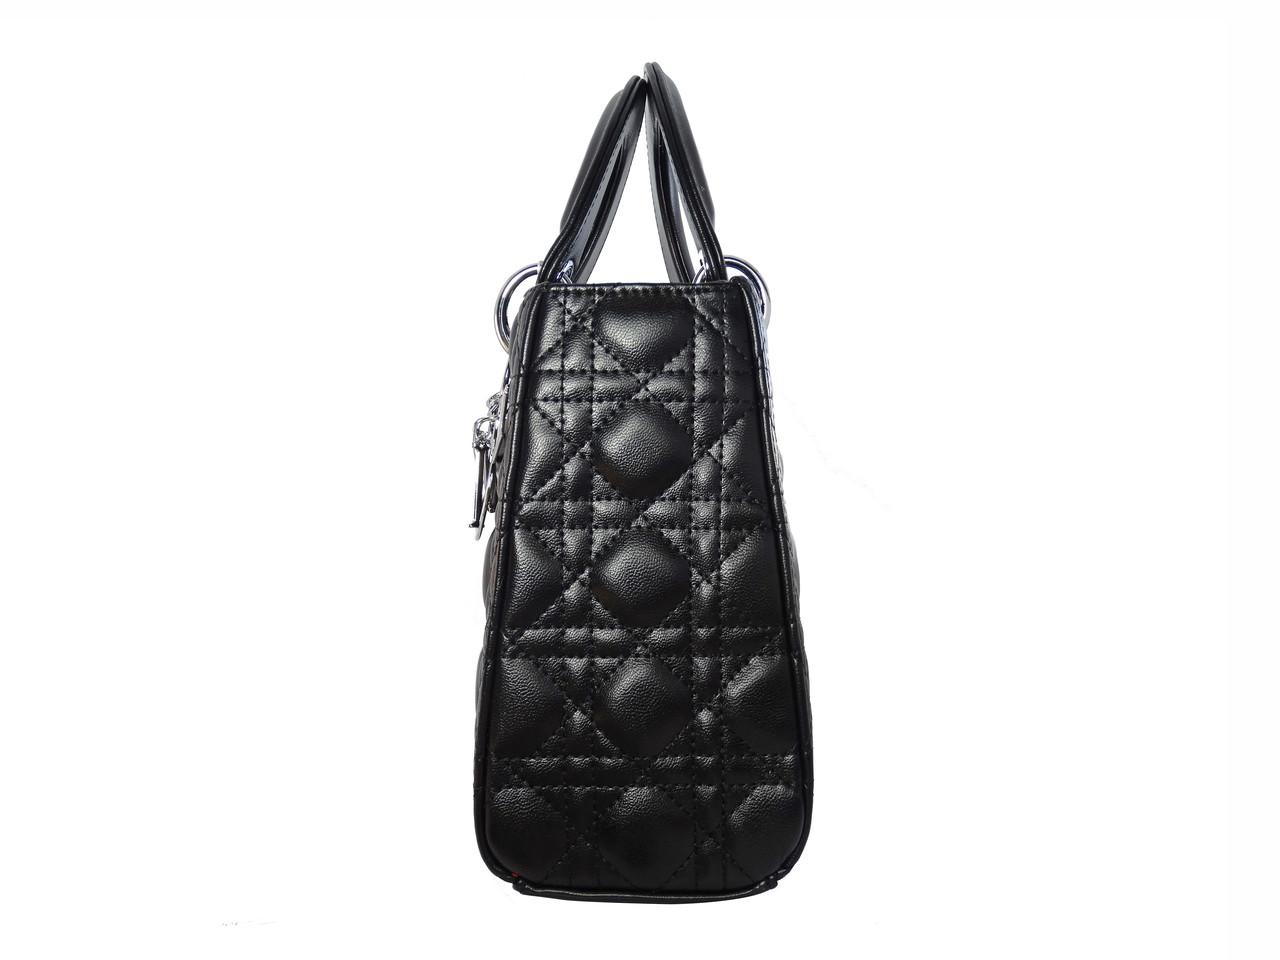 8ca39ea10003 Женская сумка в стиле Christian Dior (черная) №6101  продажа, цена в ...